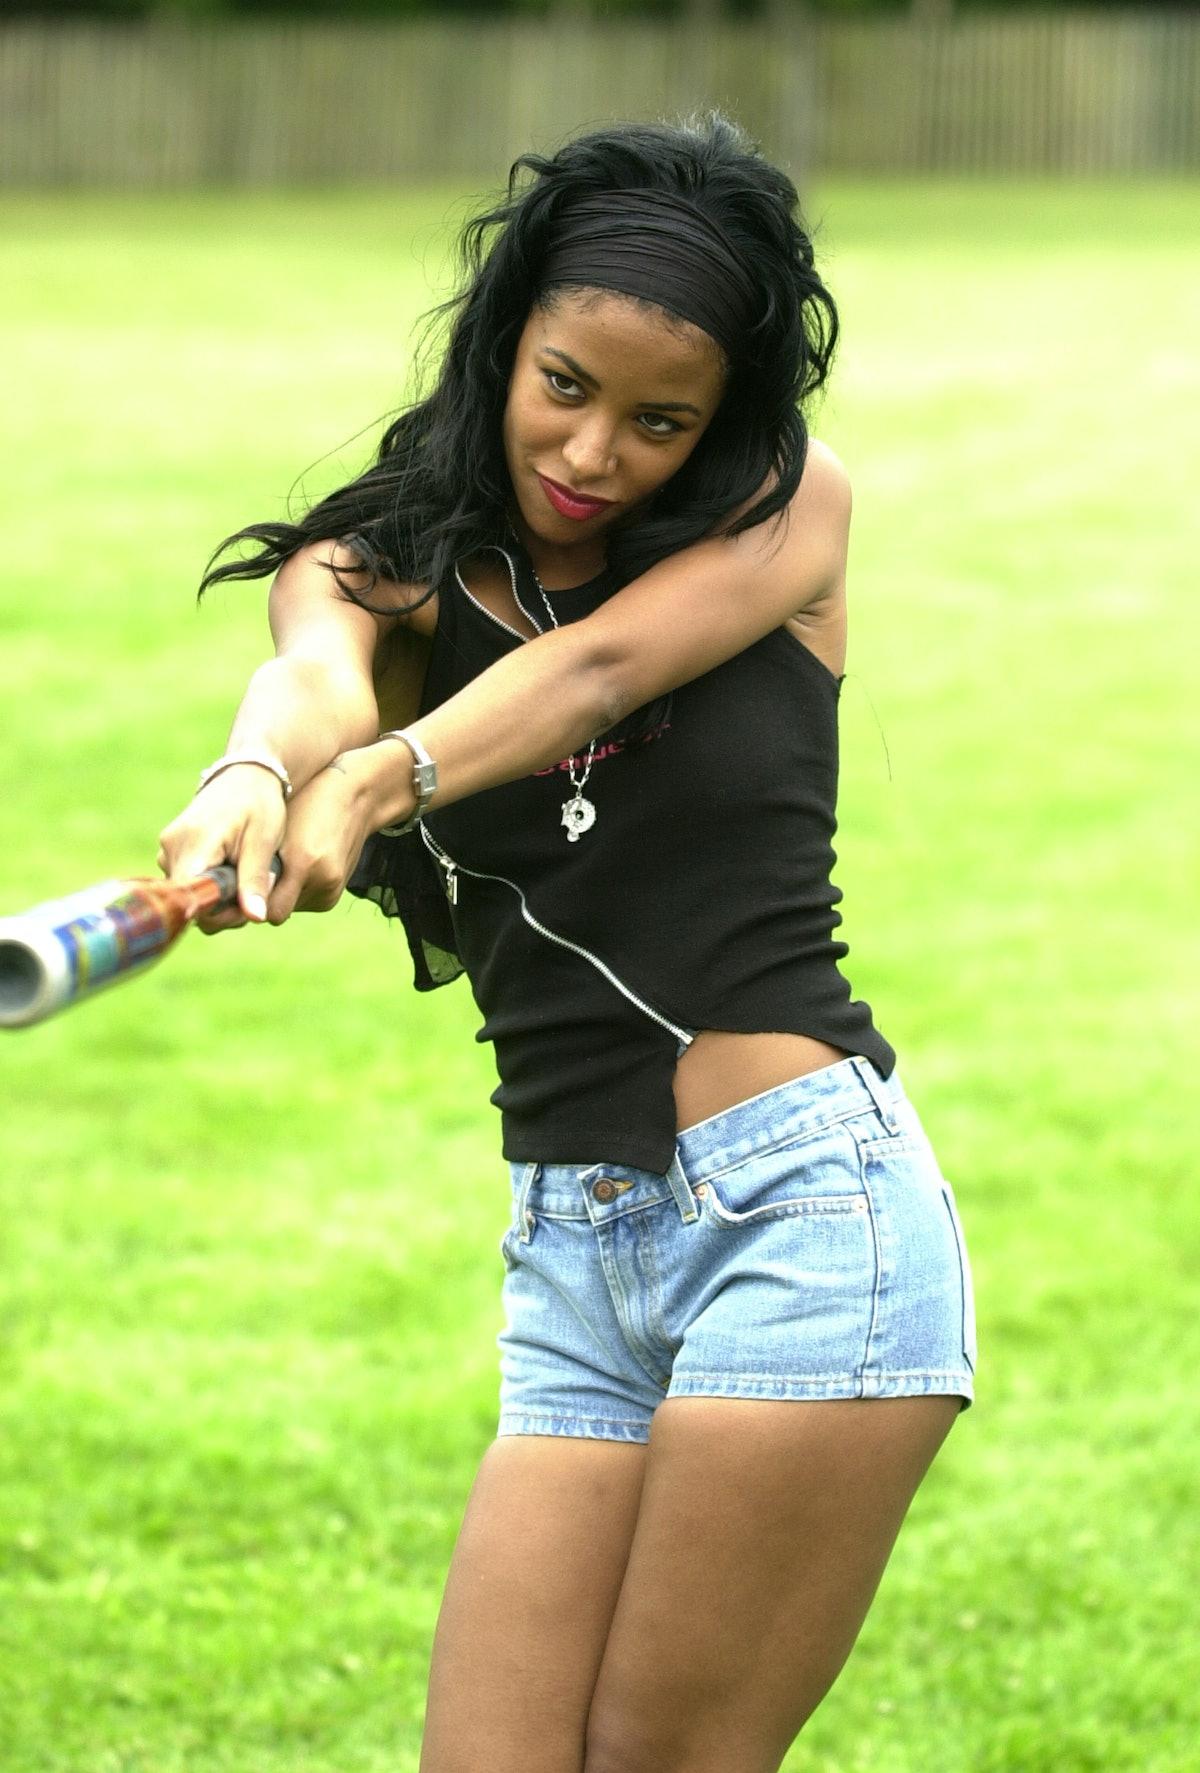 Aaliyah swinging a bat